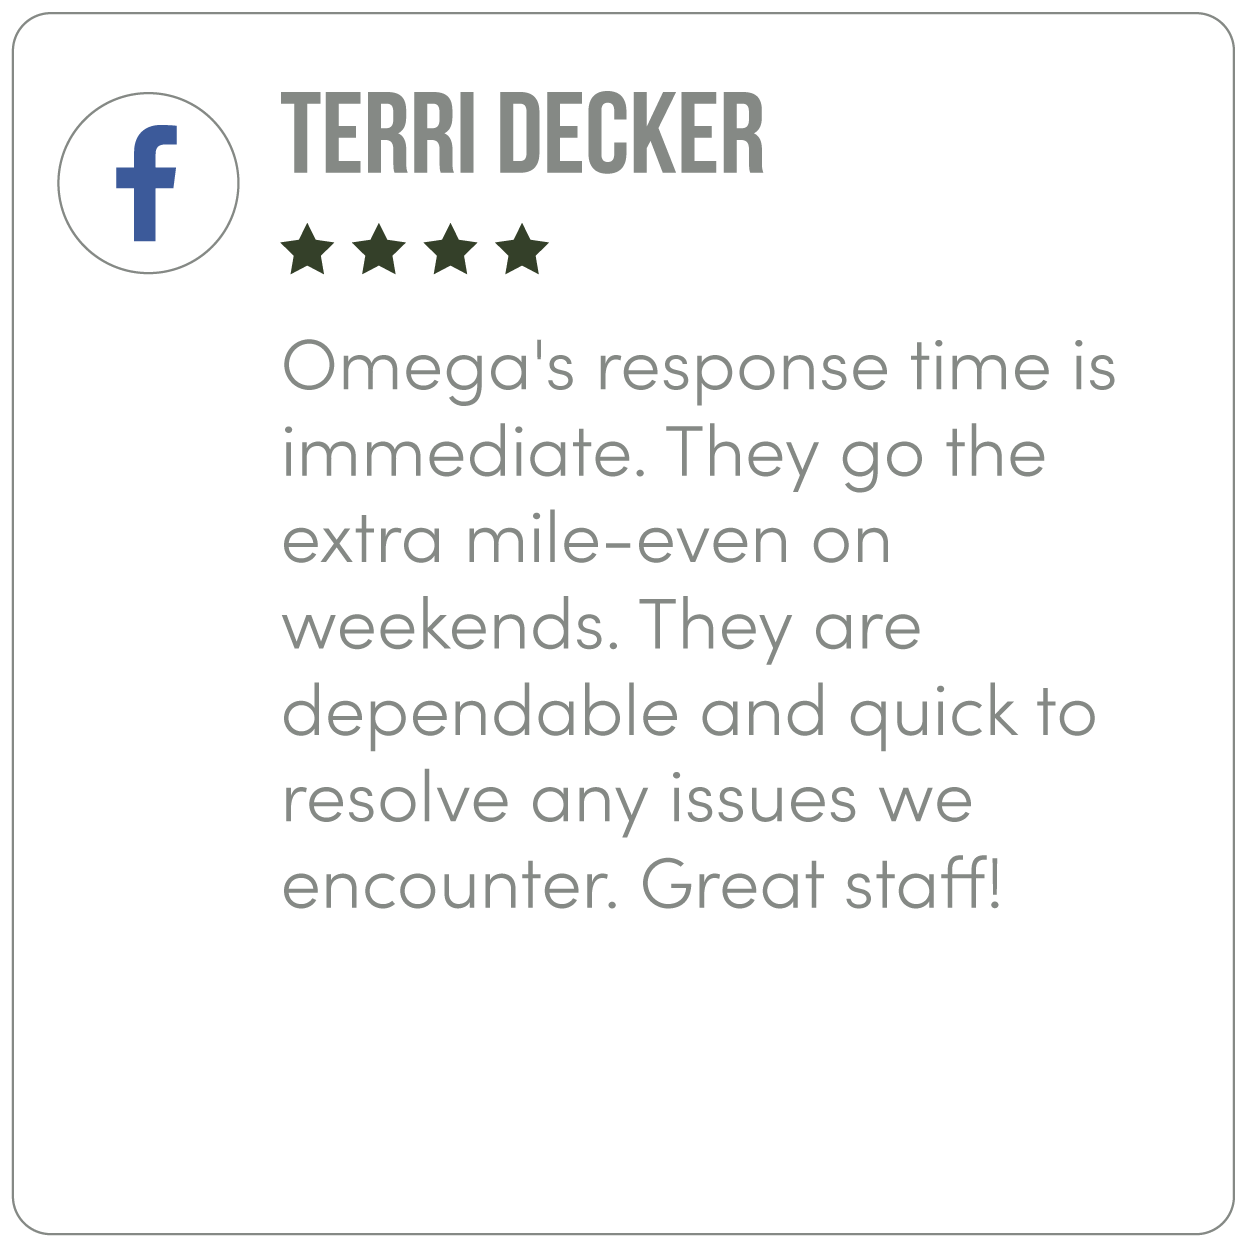 terri-decker.png